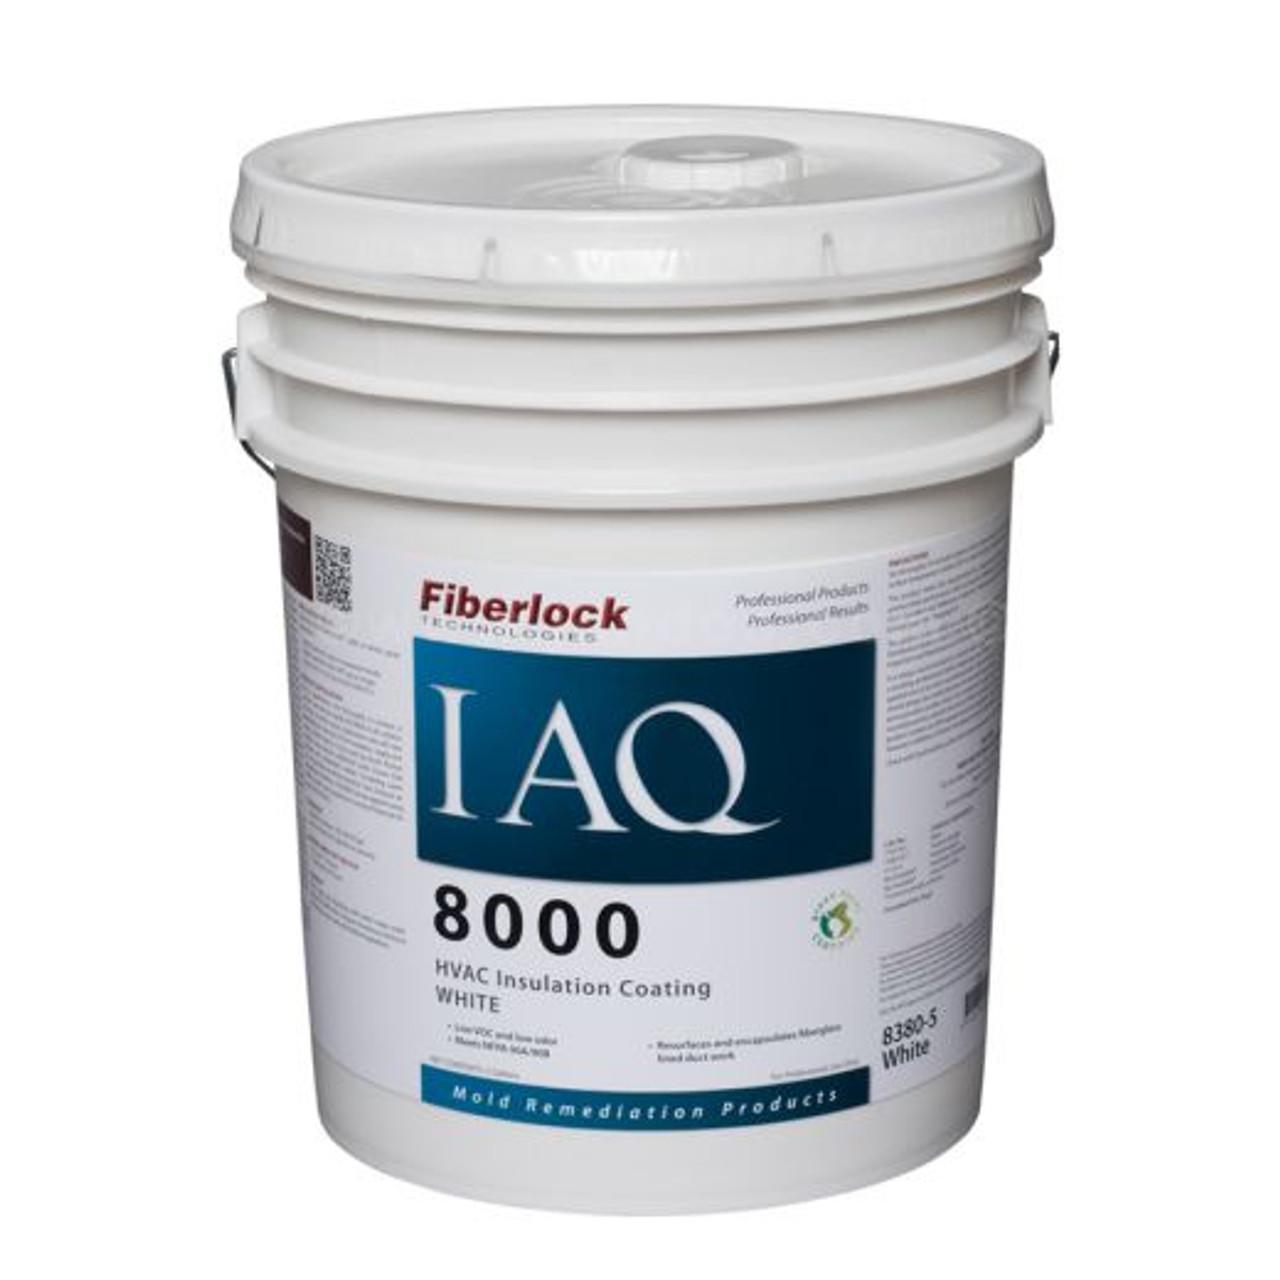 Fiberlock IAQ 8000 HVAC Insulation Coating (5 GL)